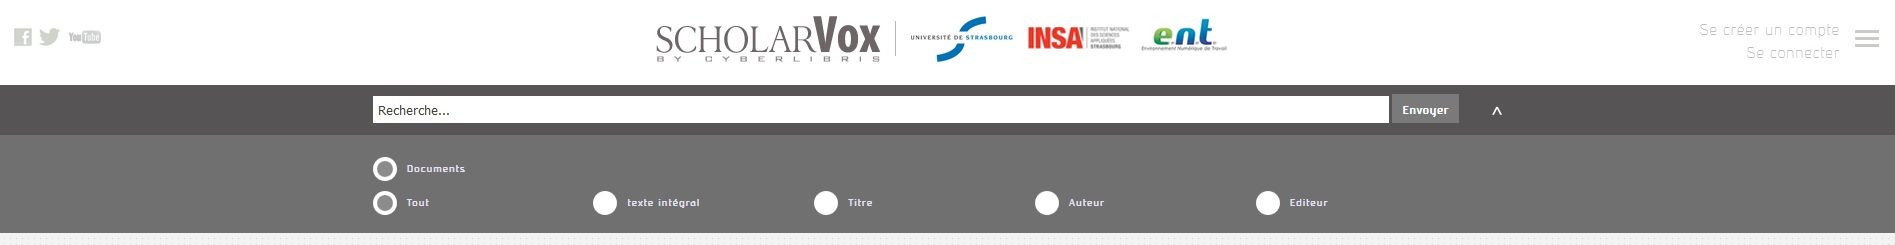 Nouvelle interface Scholarvox 1